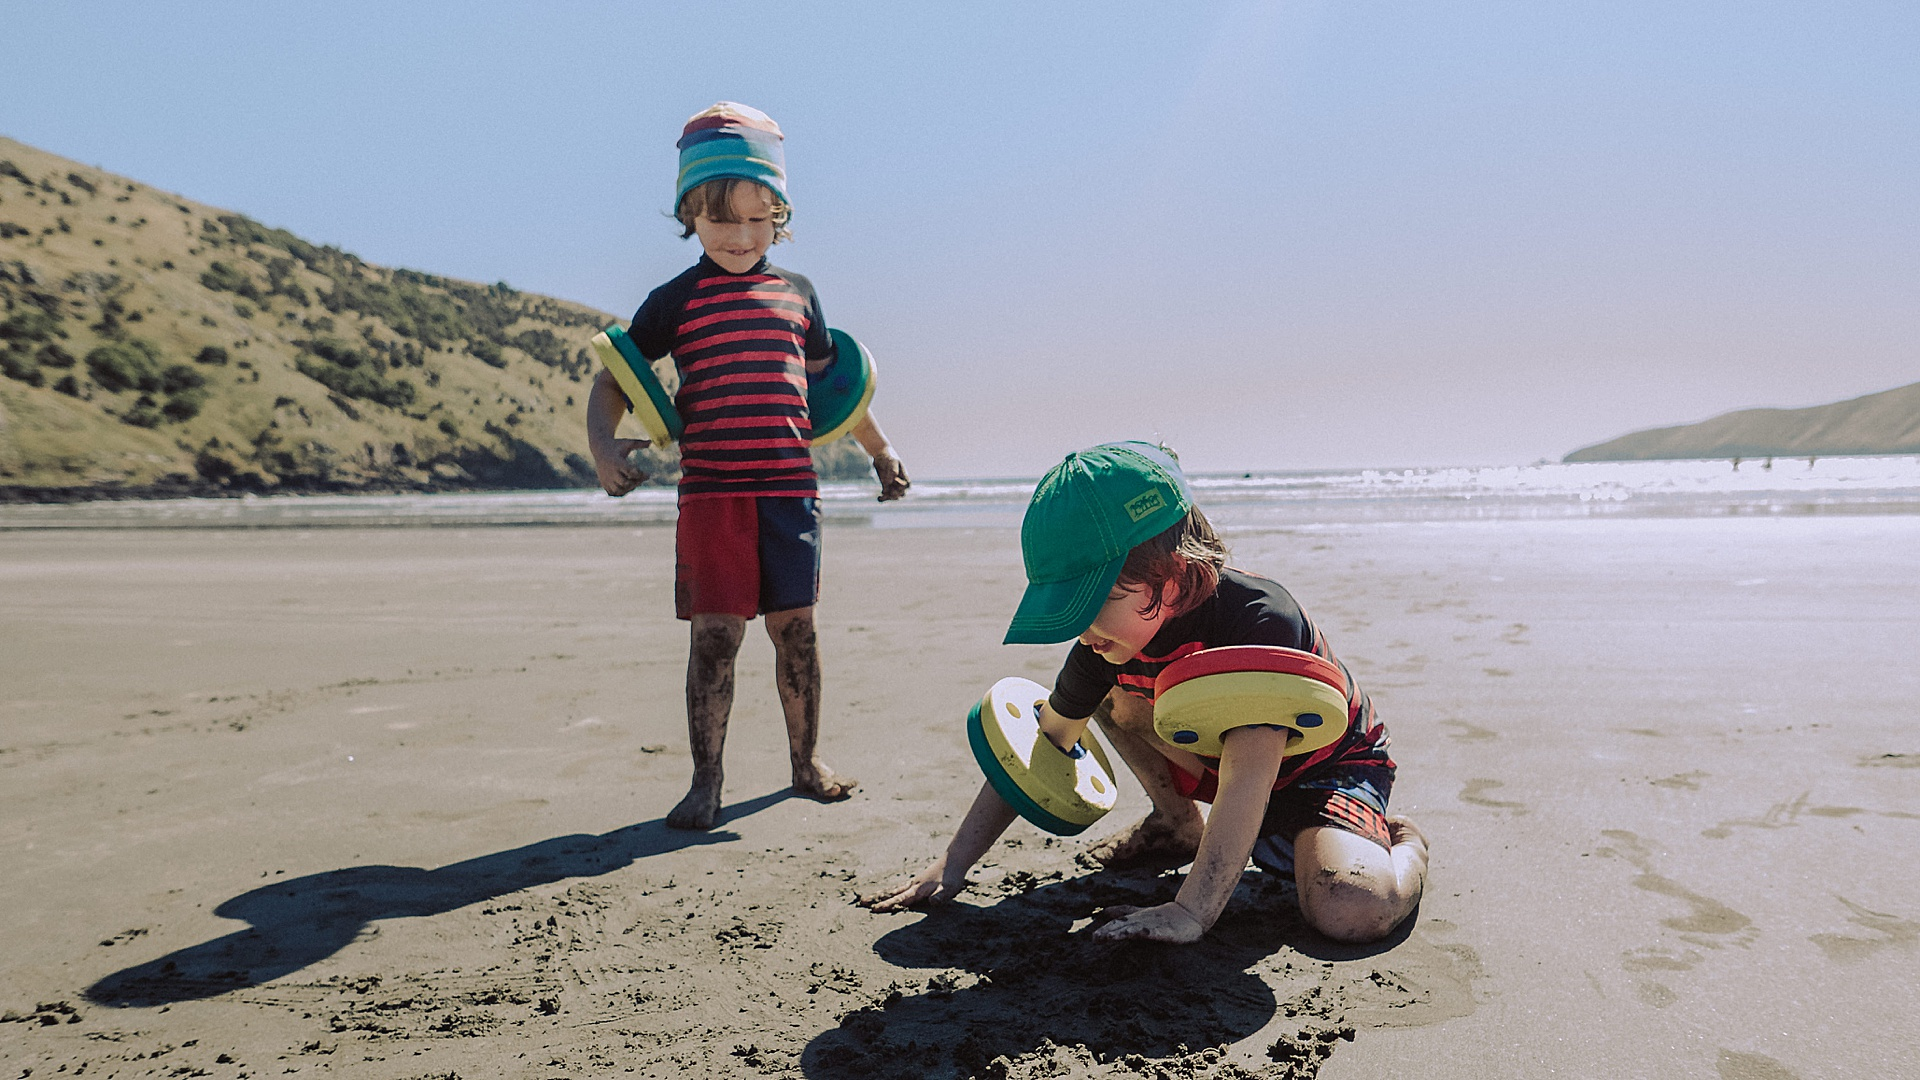 family-roadtrip-neuseeland-travelnewzealand-danielzube_0500.jpg